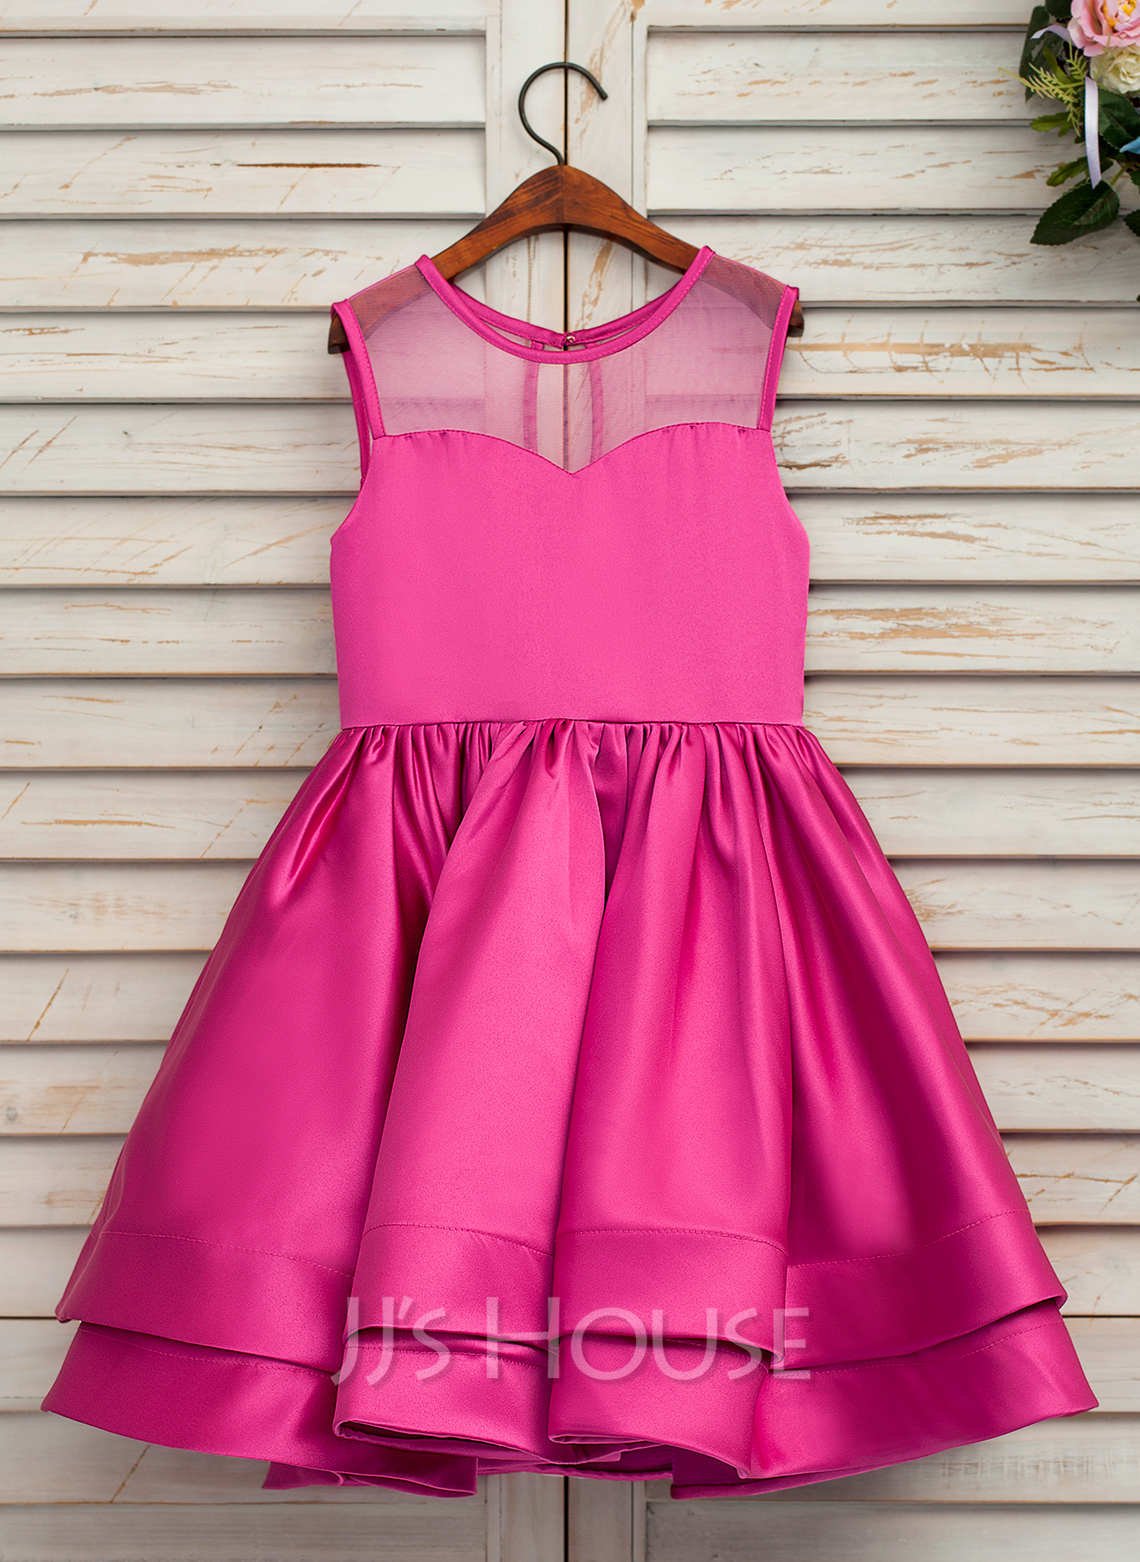 A-Line/Princess Tea-length Flower Girl Dress - Satin/Tulle Sleeveless Scoop Neck